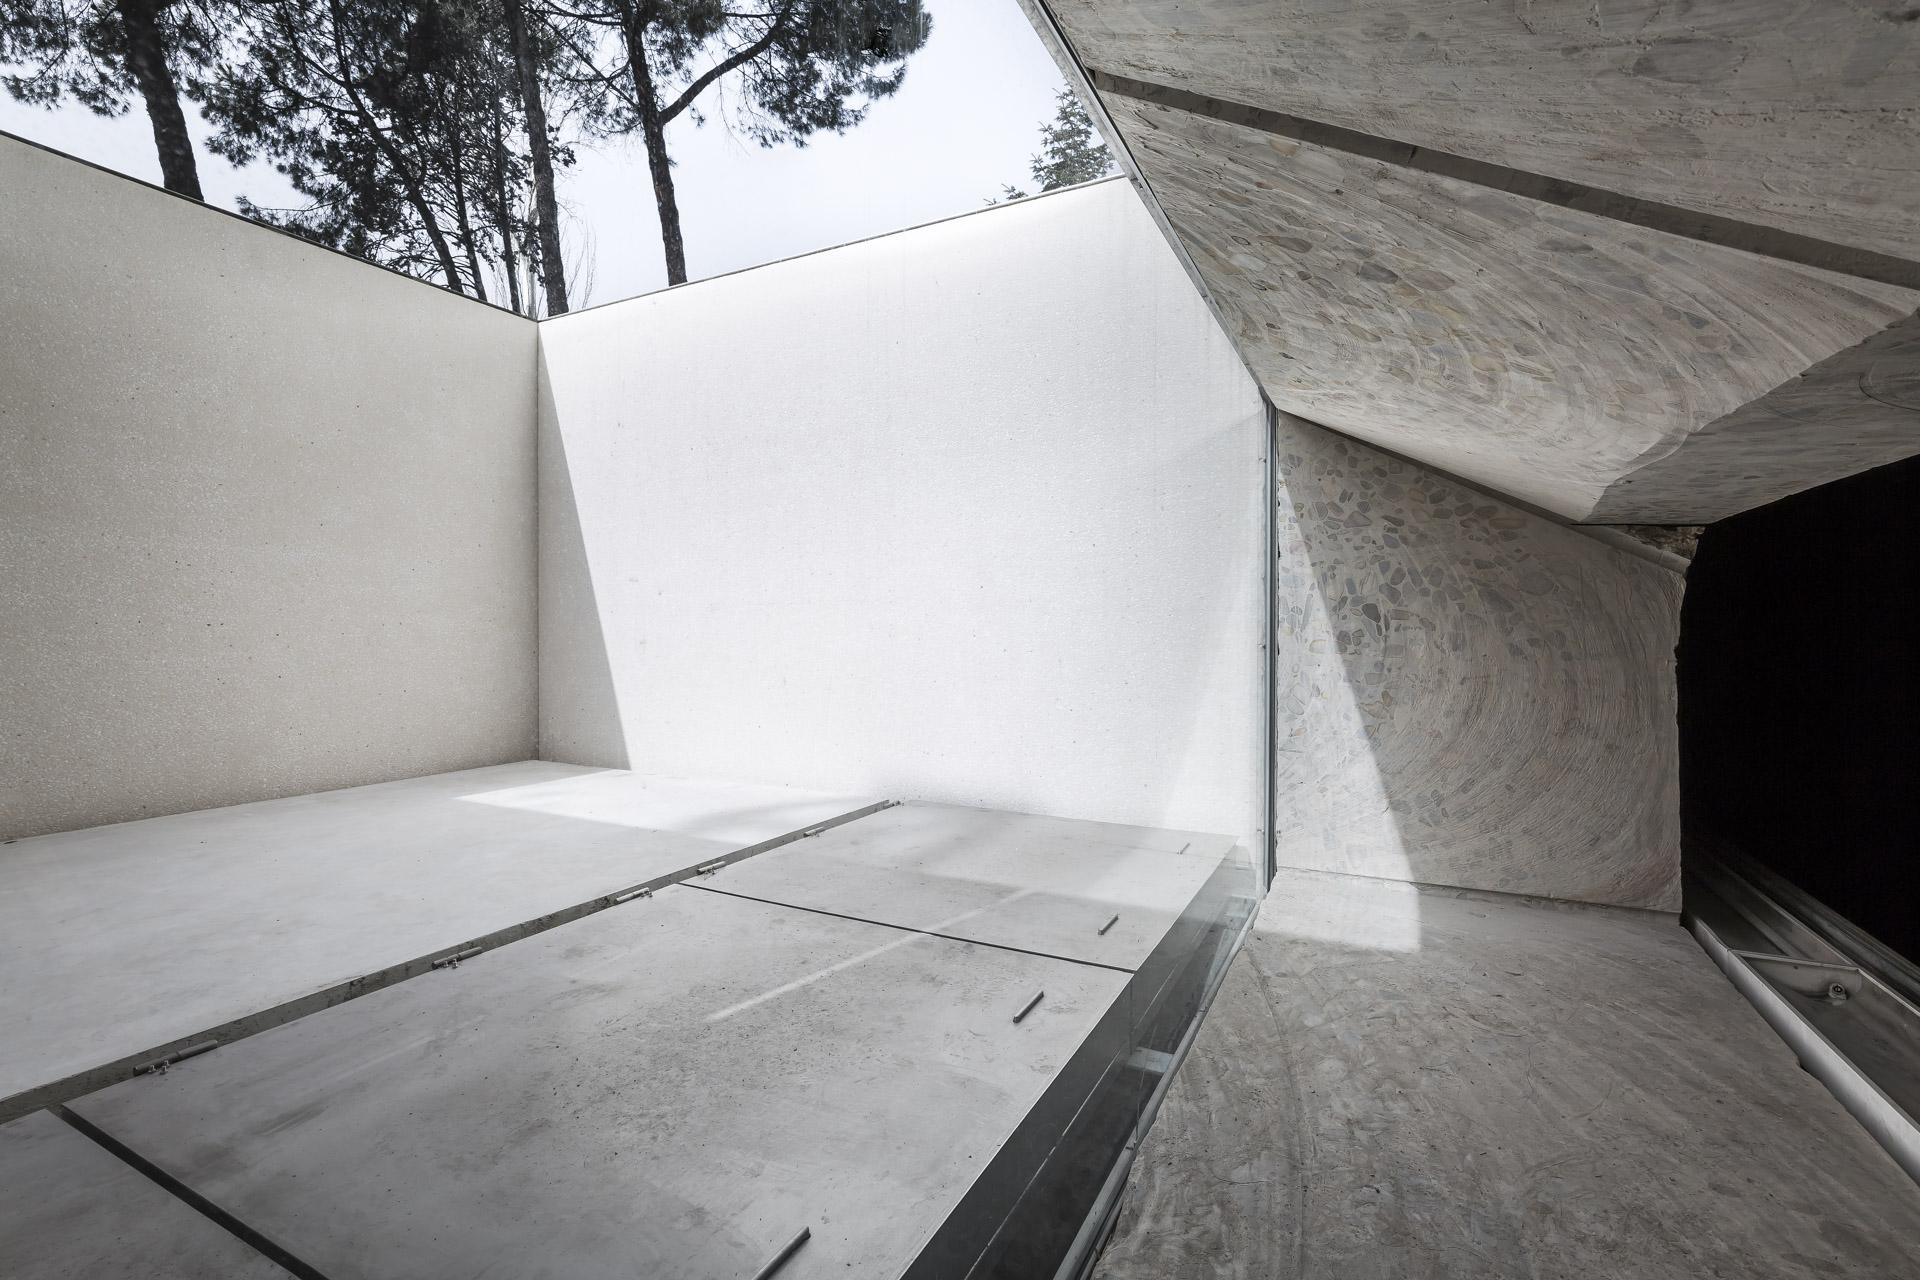 fotografia-arquitectura-madrid-nuevos-ministerios-elorza-german-cabo-10